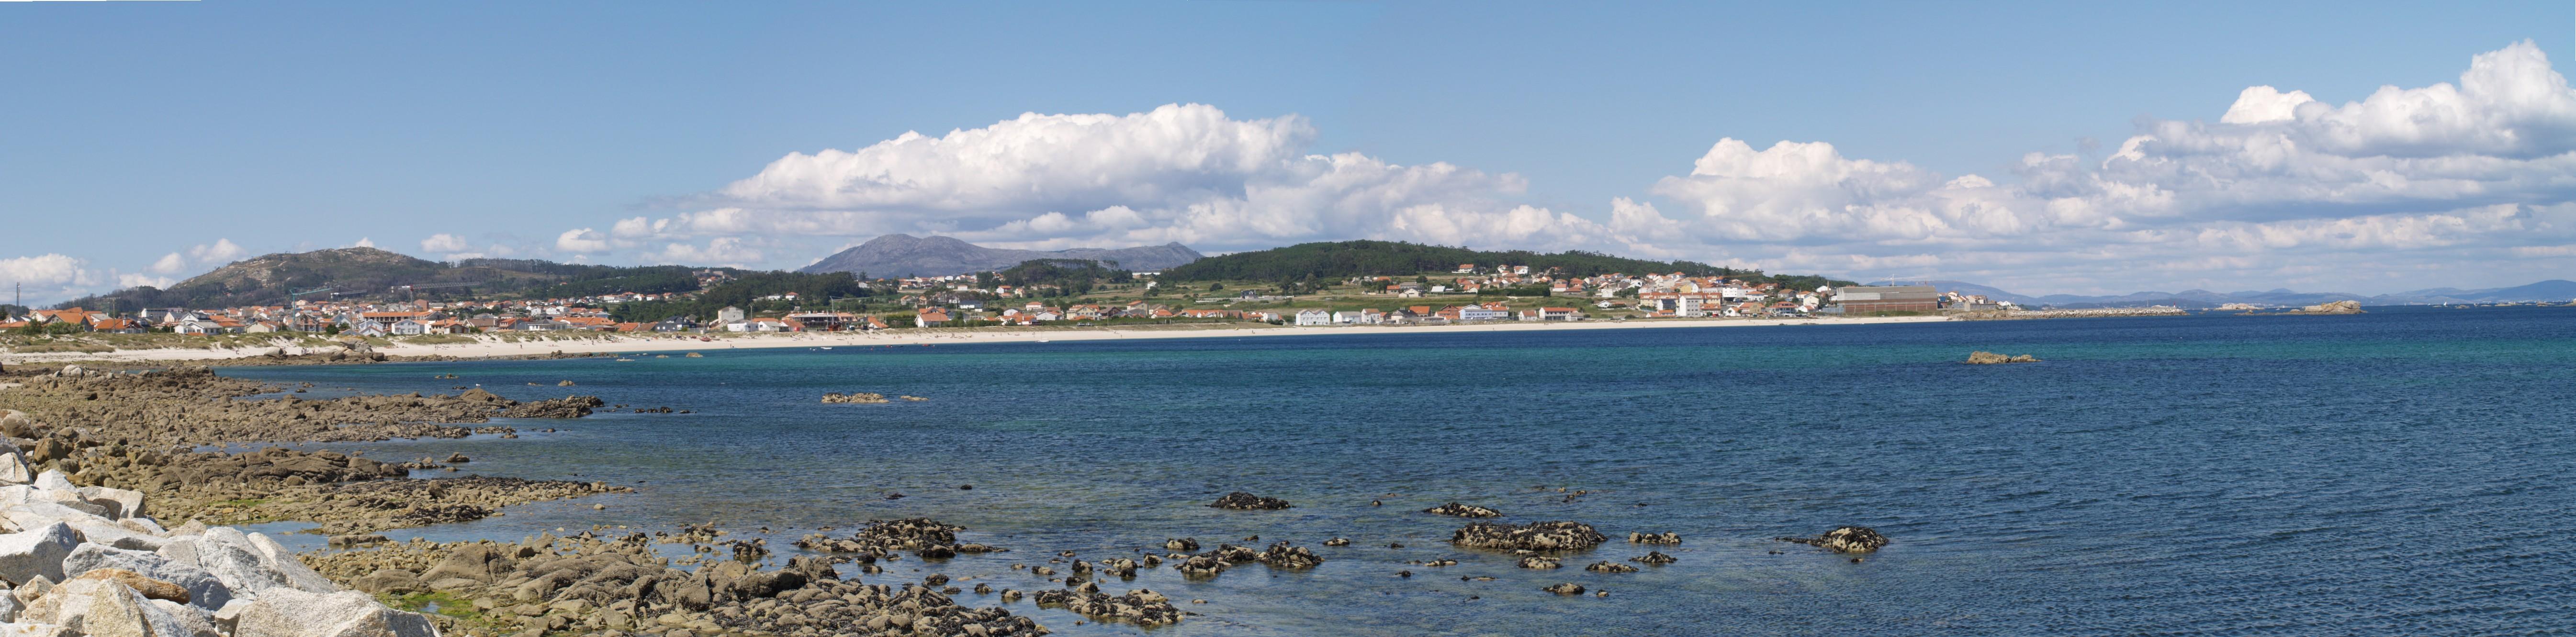 Foto playa Tasca. praia de aguiño